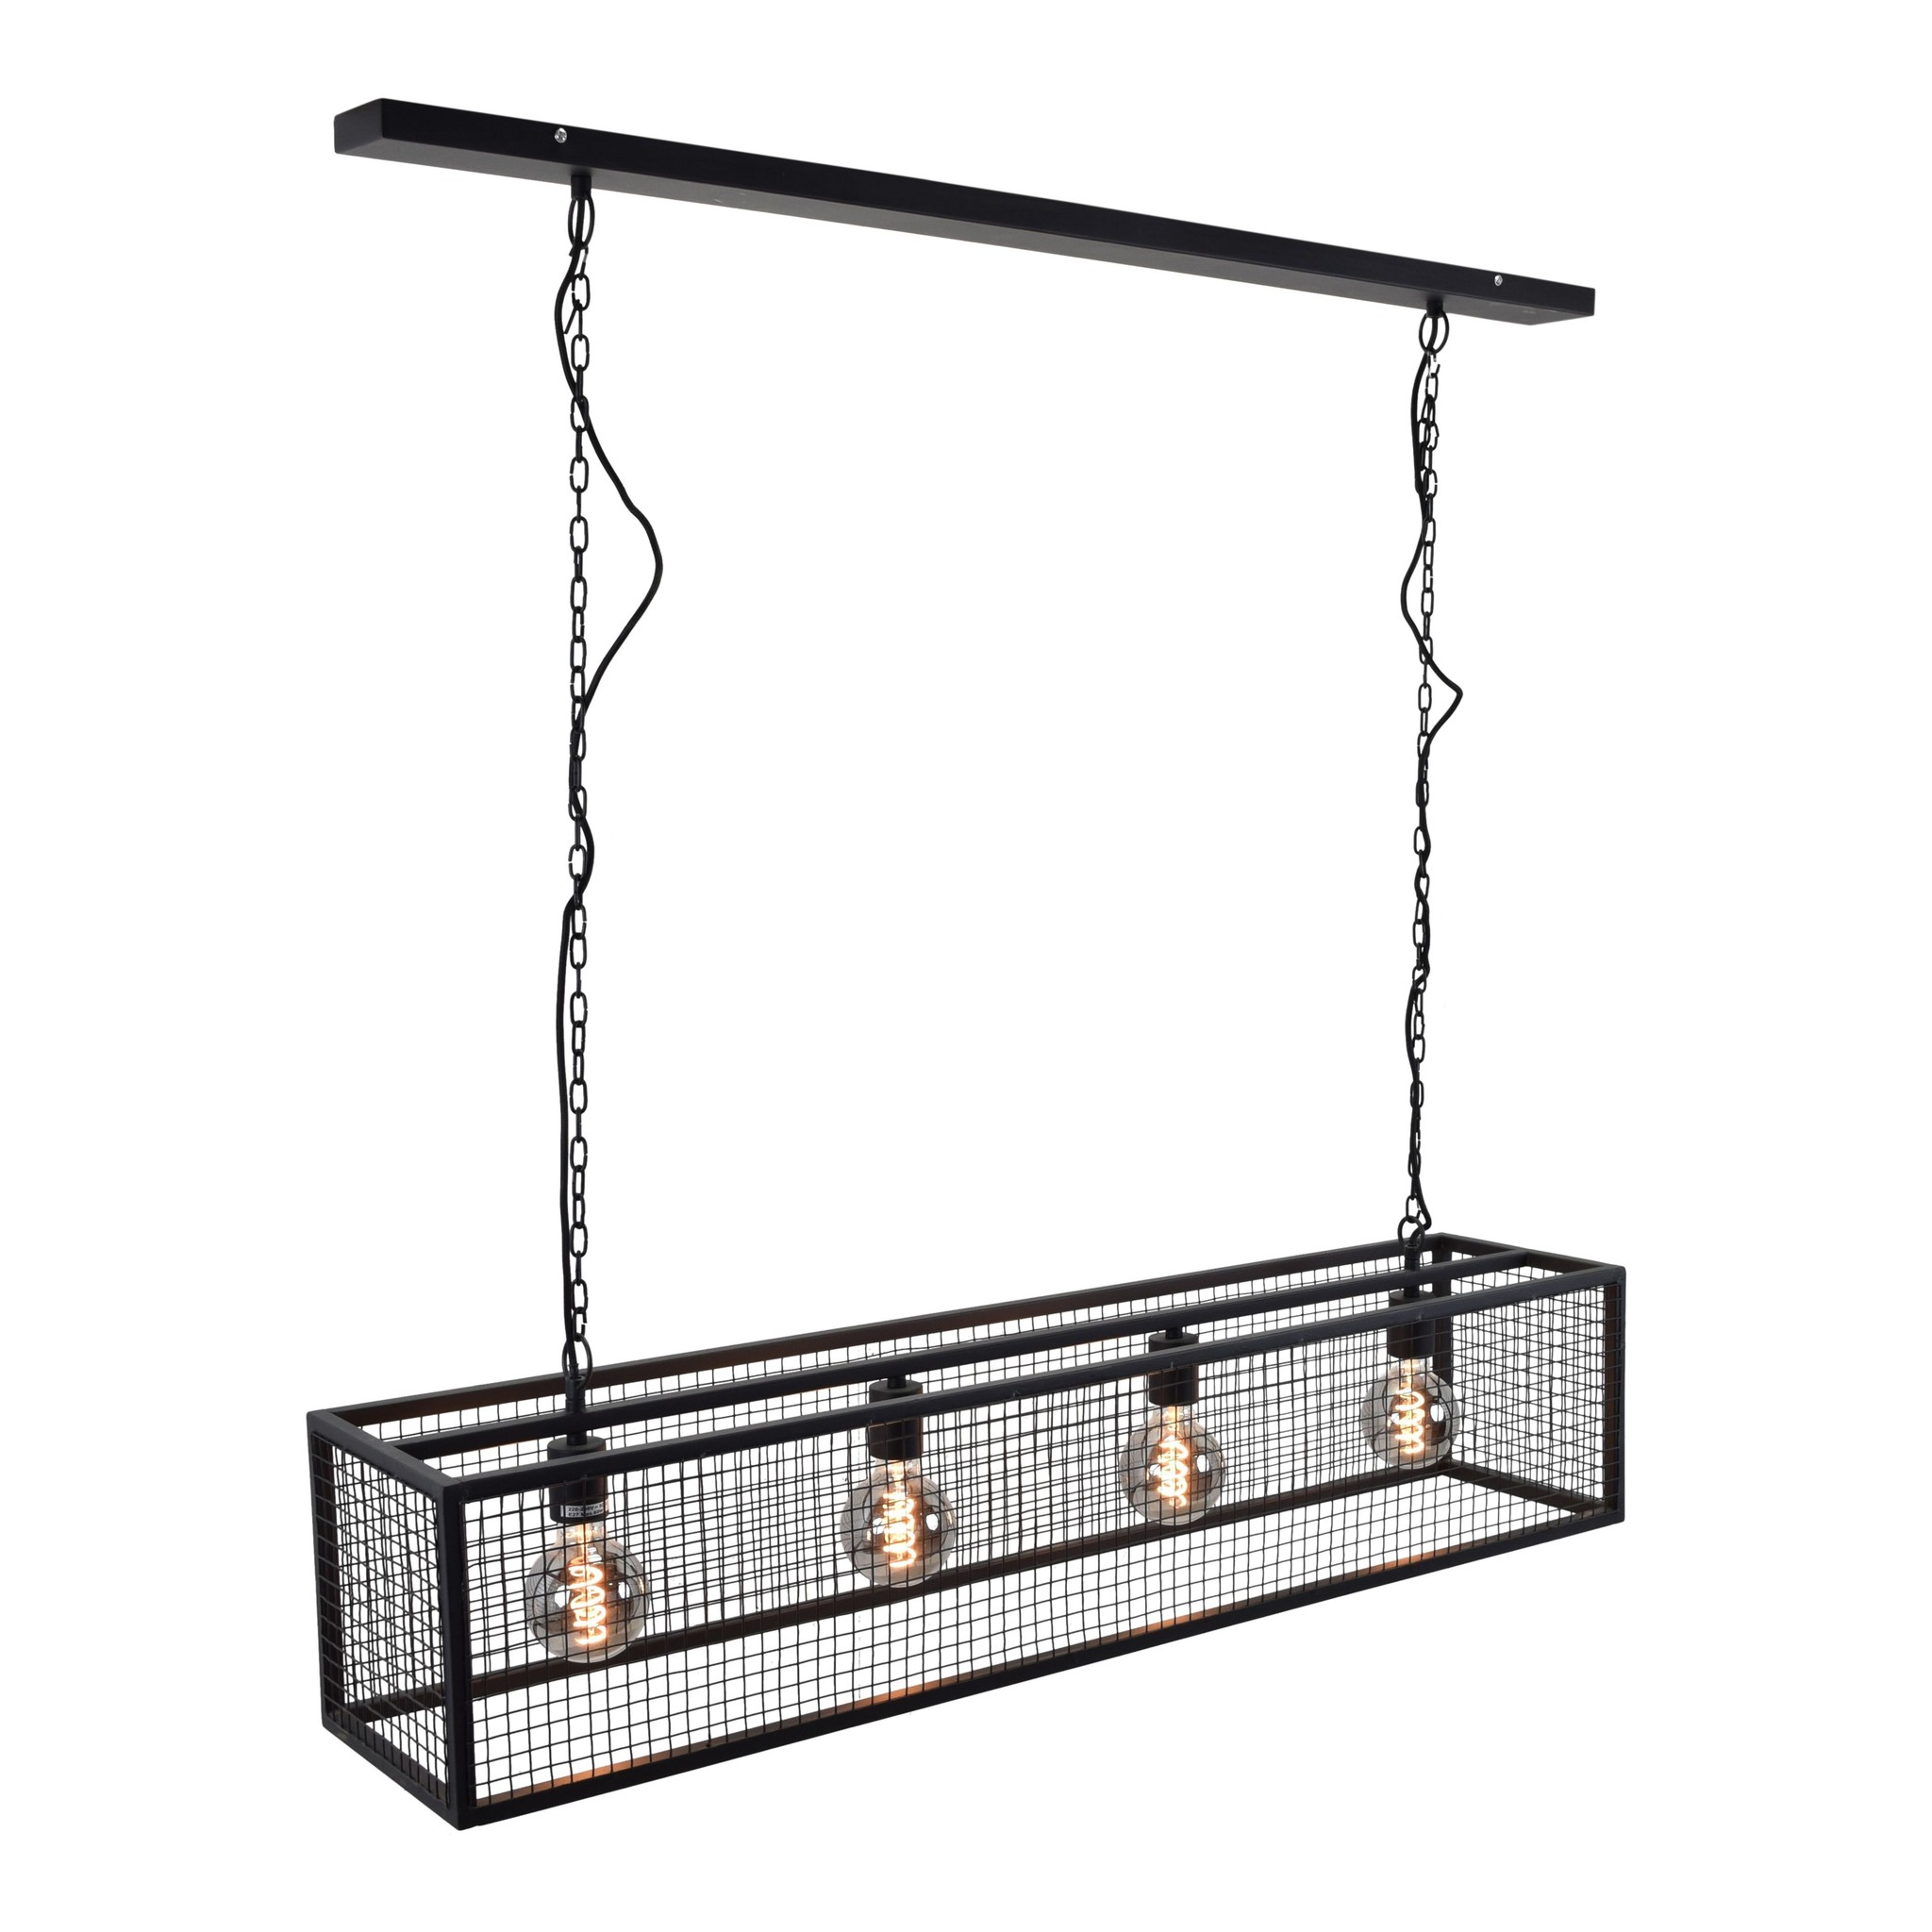 Urban Interiors Hanglamp Frame Gaas 4 lichts L 120 cm B 25 cm zwart